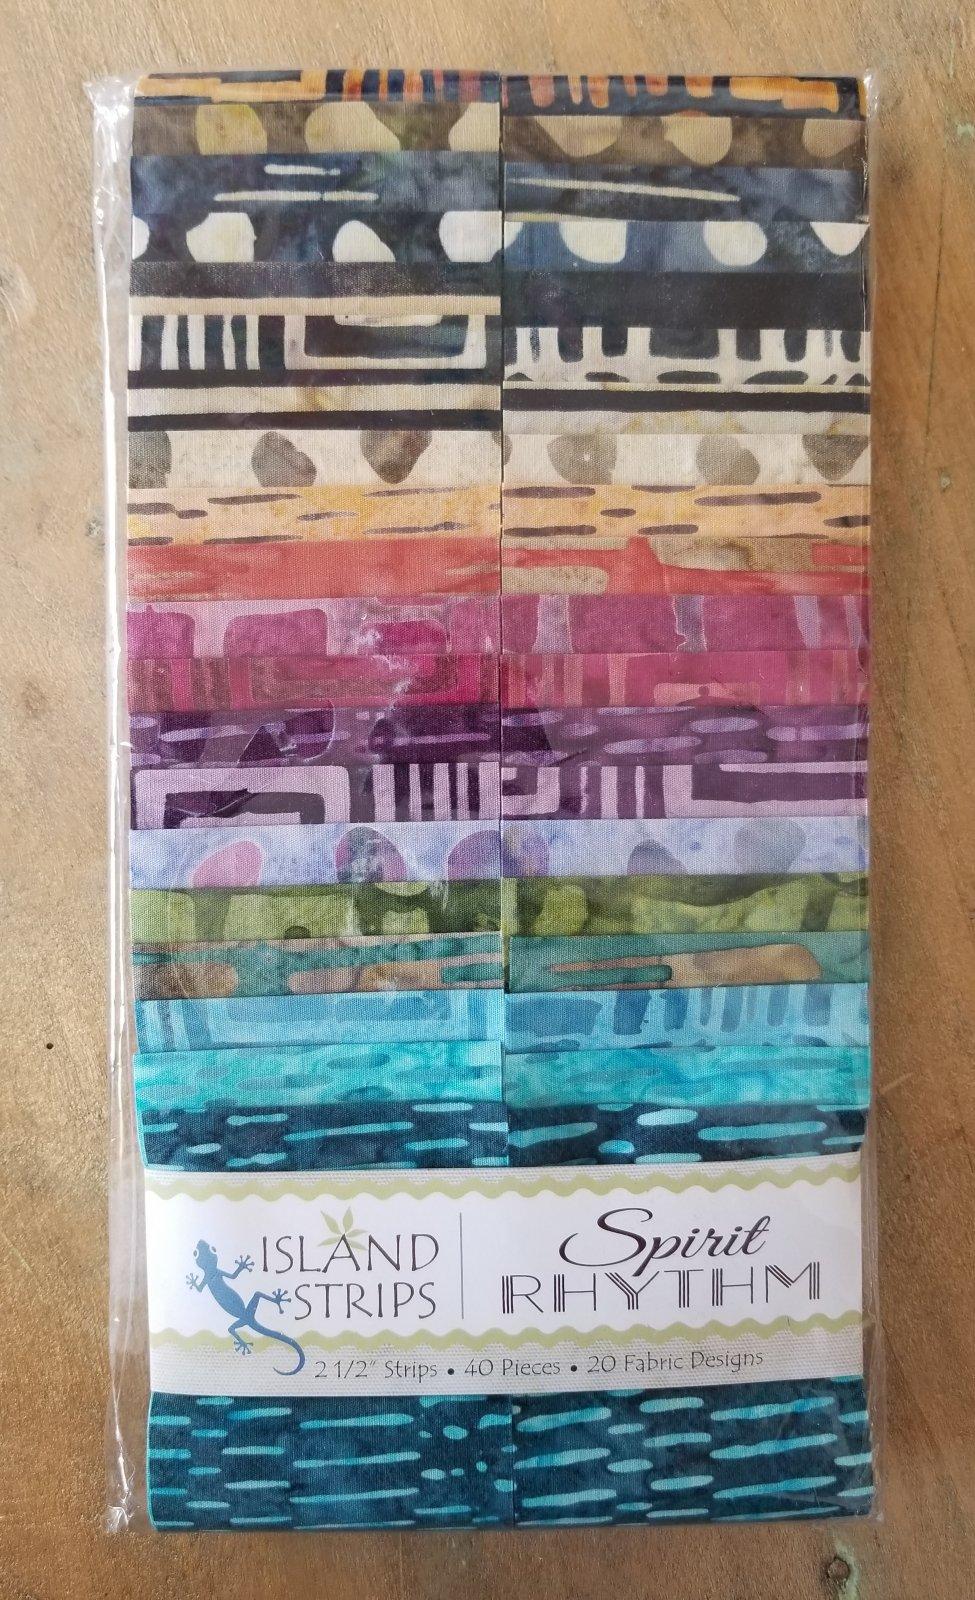 Spirit Rhythm 2.5 Strip Pack by Island Batik